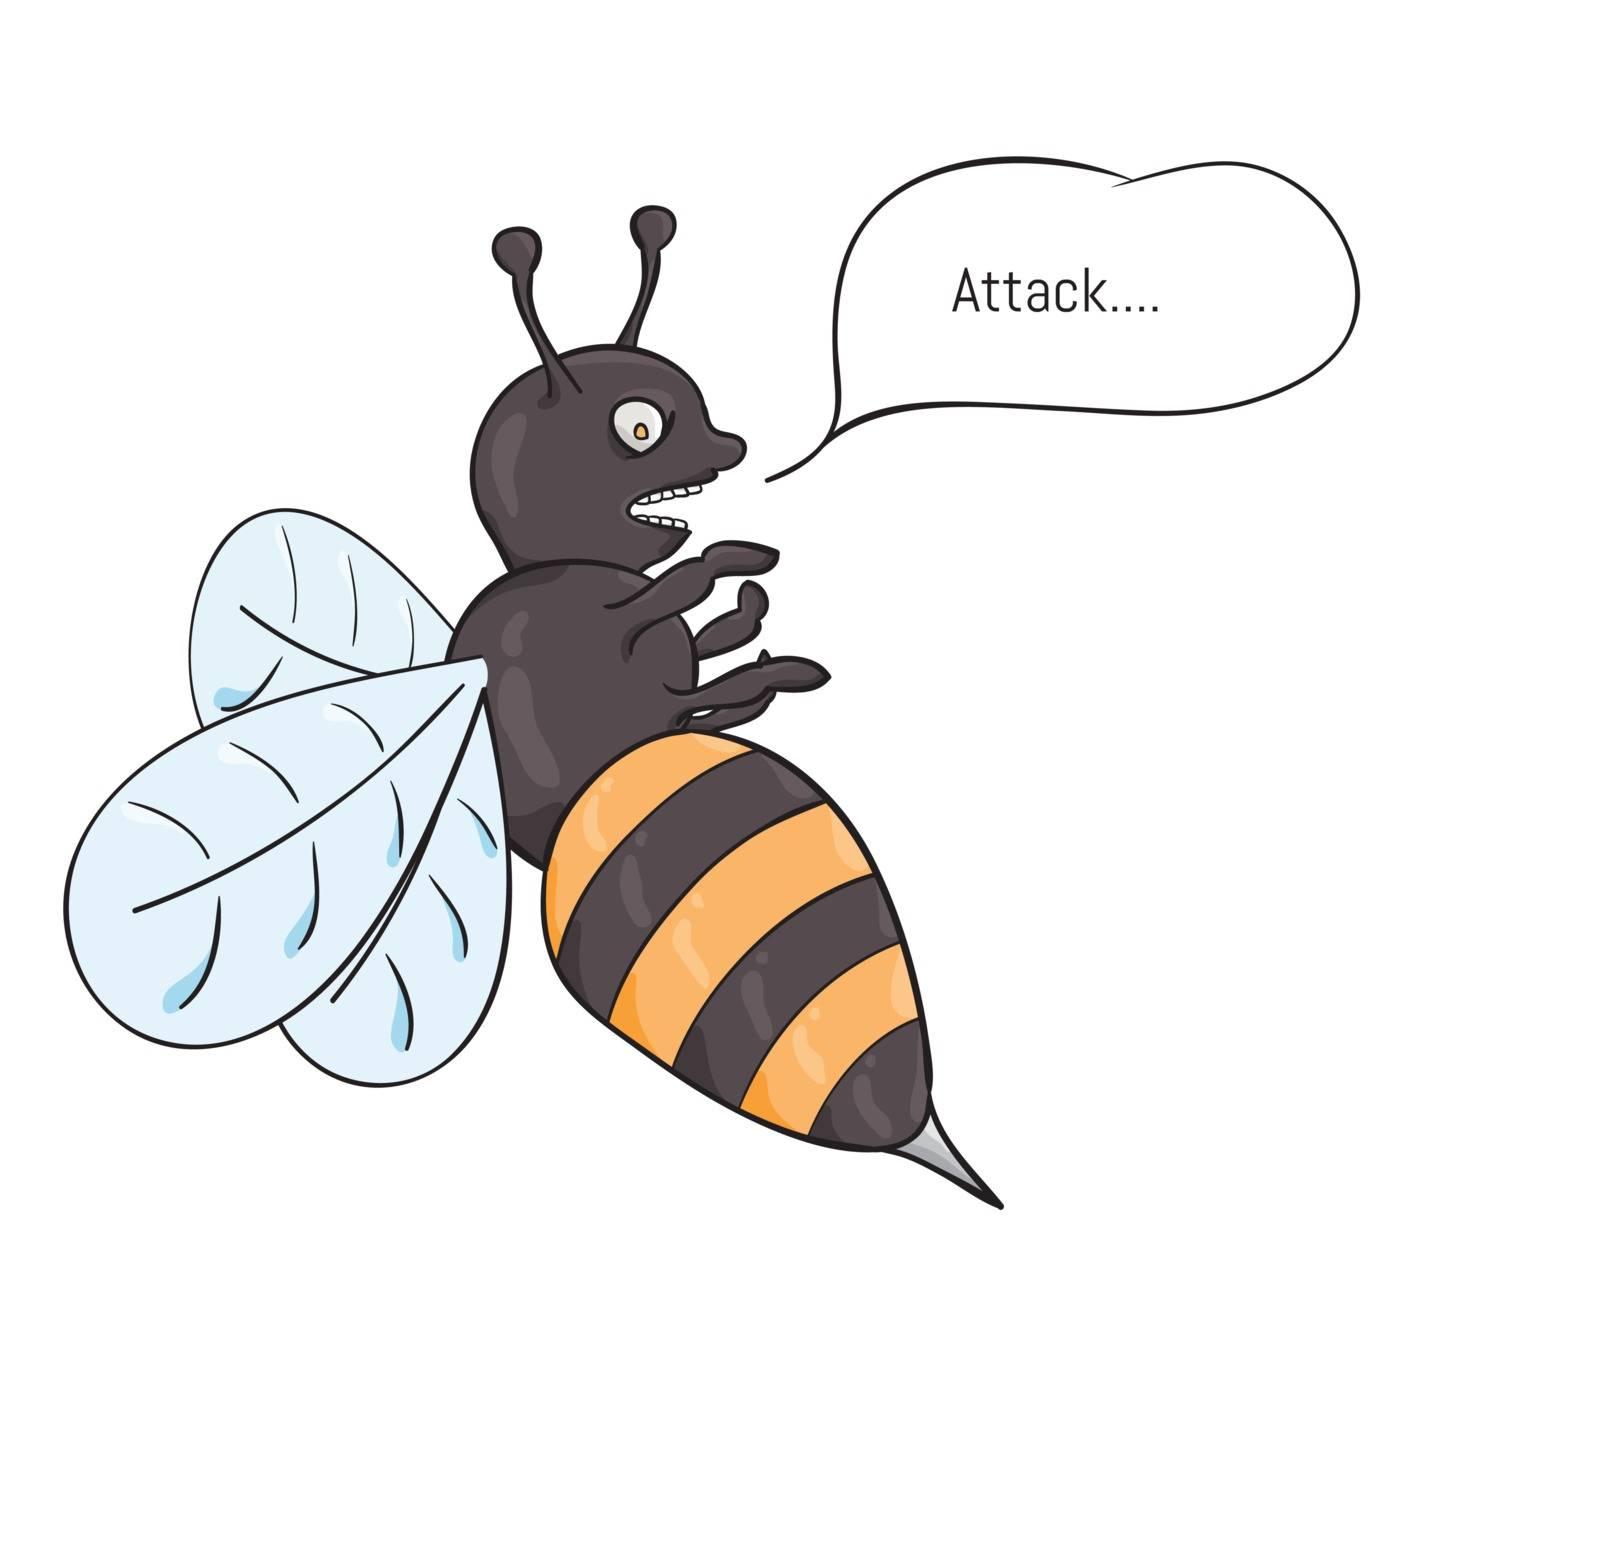 Aggressive wasp attacking with sting full of venom. Cartoon illustration.